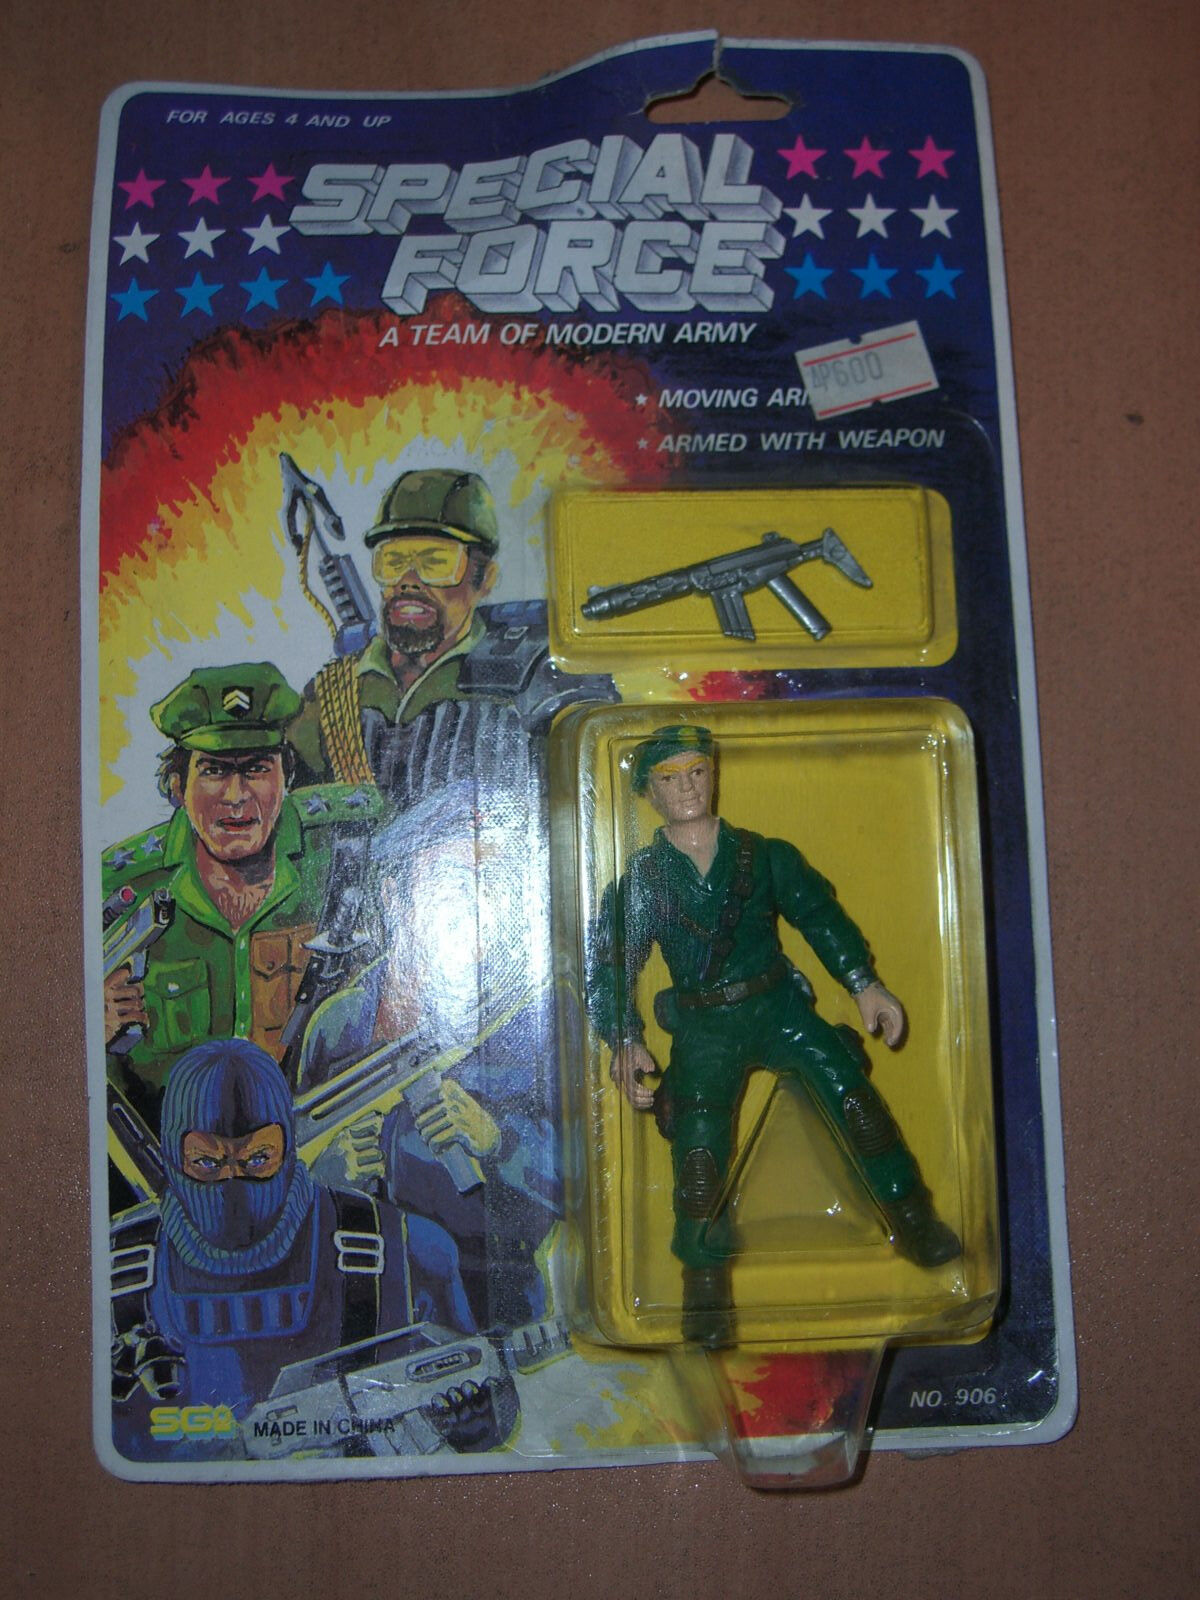 80'S GI JOE KO VINTAGE SPECIAL FORCE DIALTONE FIGURE SGI SGI SGI SUNGold MOC 09a34c